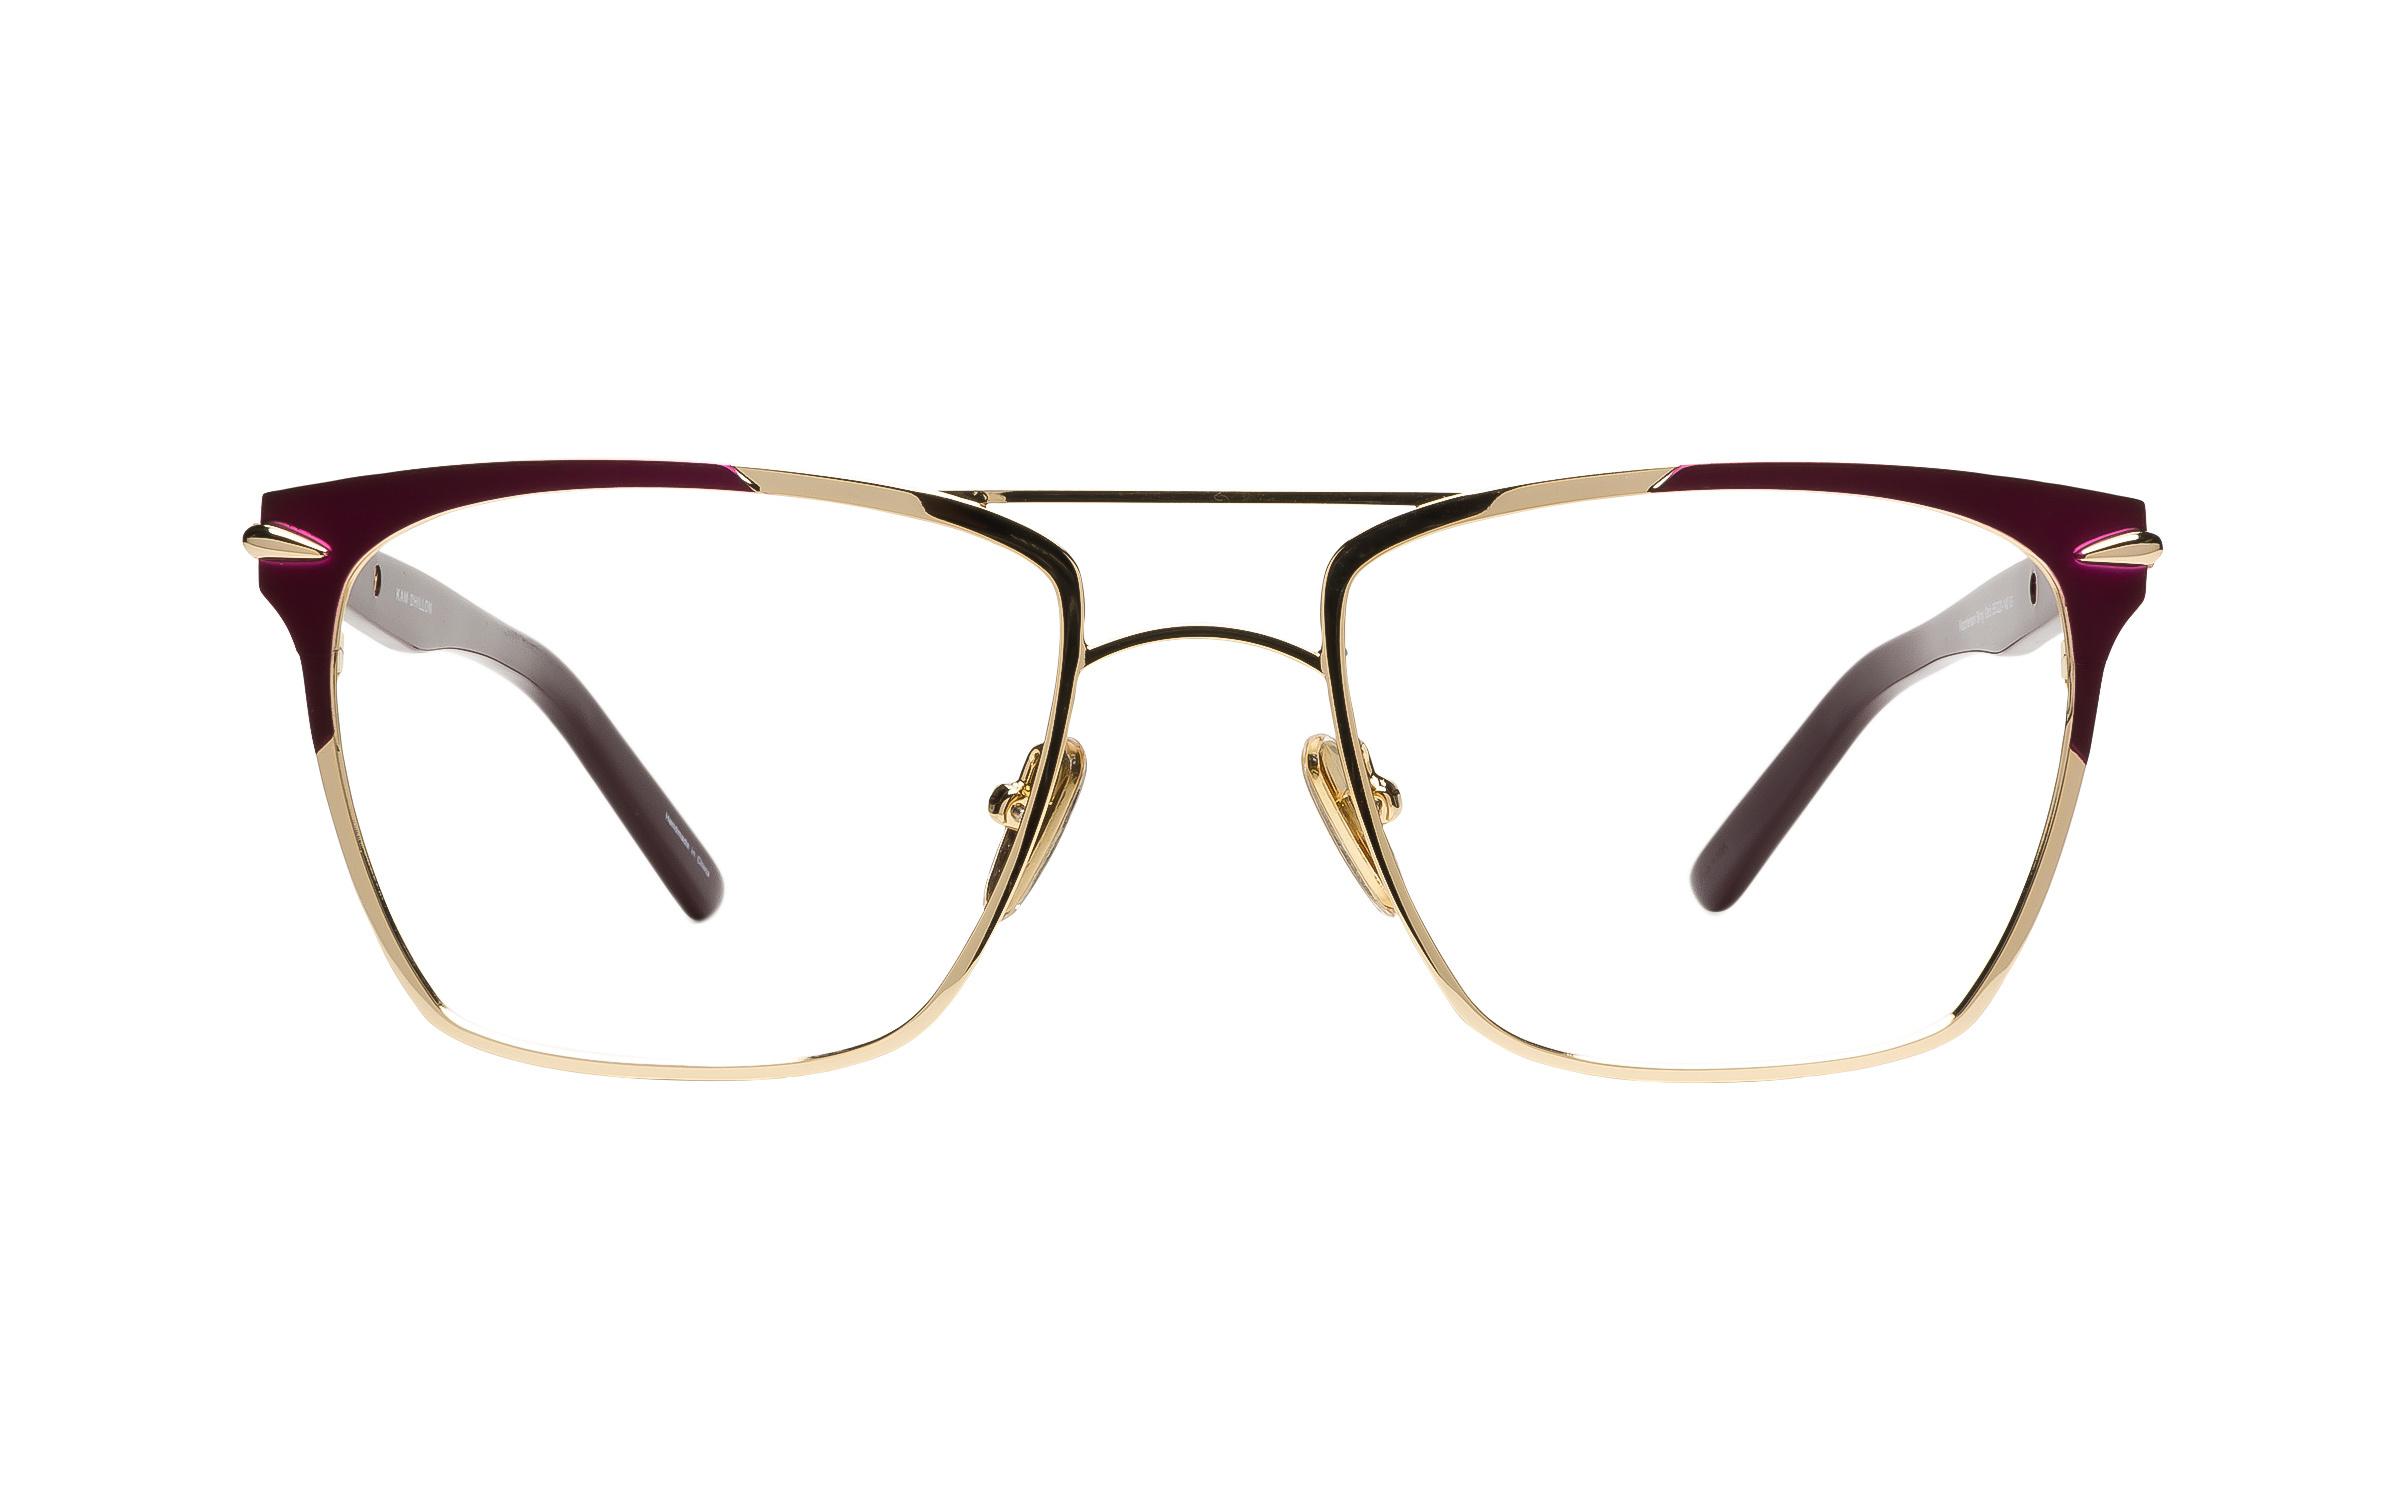 Women's Gold Acetate Aviator Kam Dhillon Glasses - Clearly Glasses Online